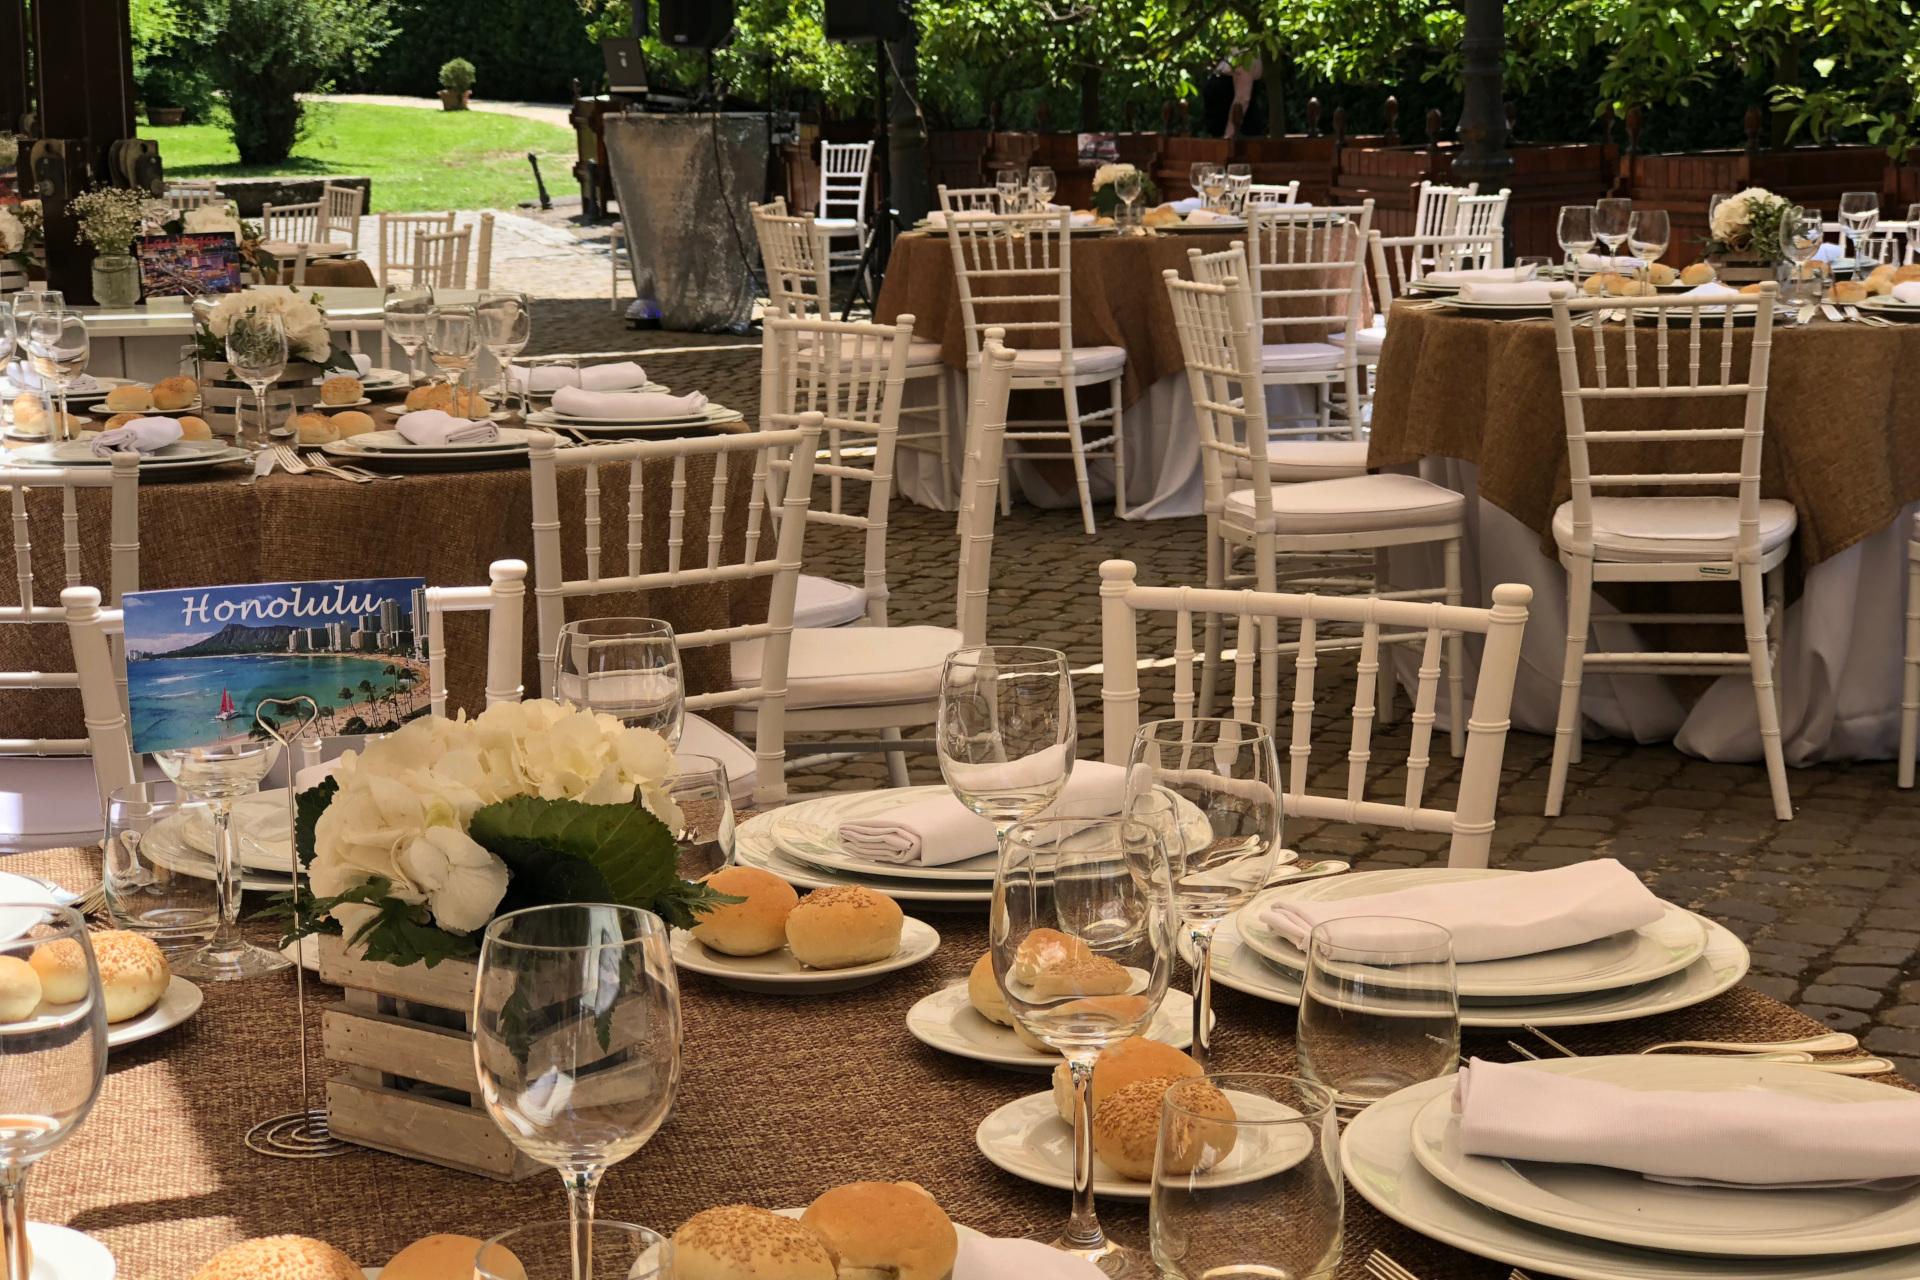 Matrimonio Country Chic Castelli Romani : Matrimonio country roma maan catering banqueting frascati